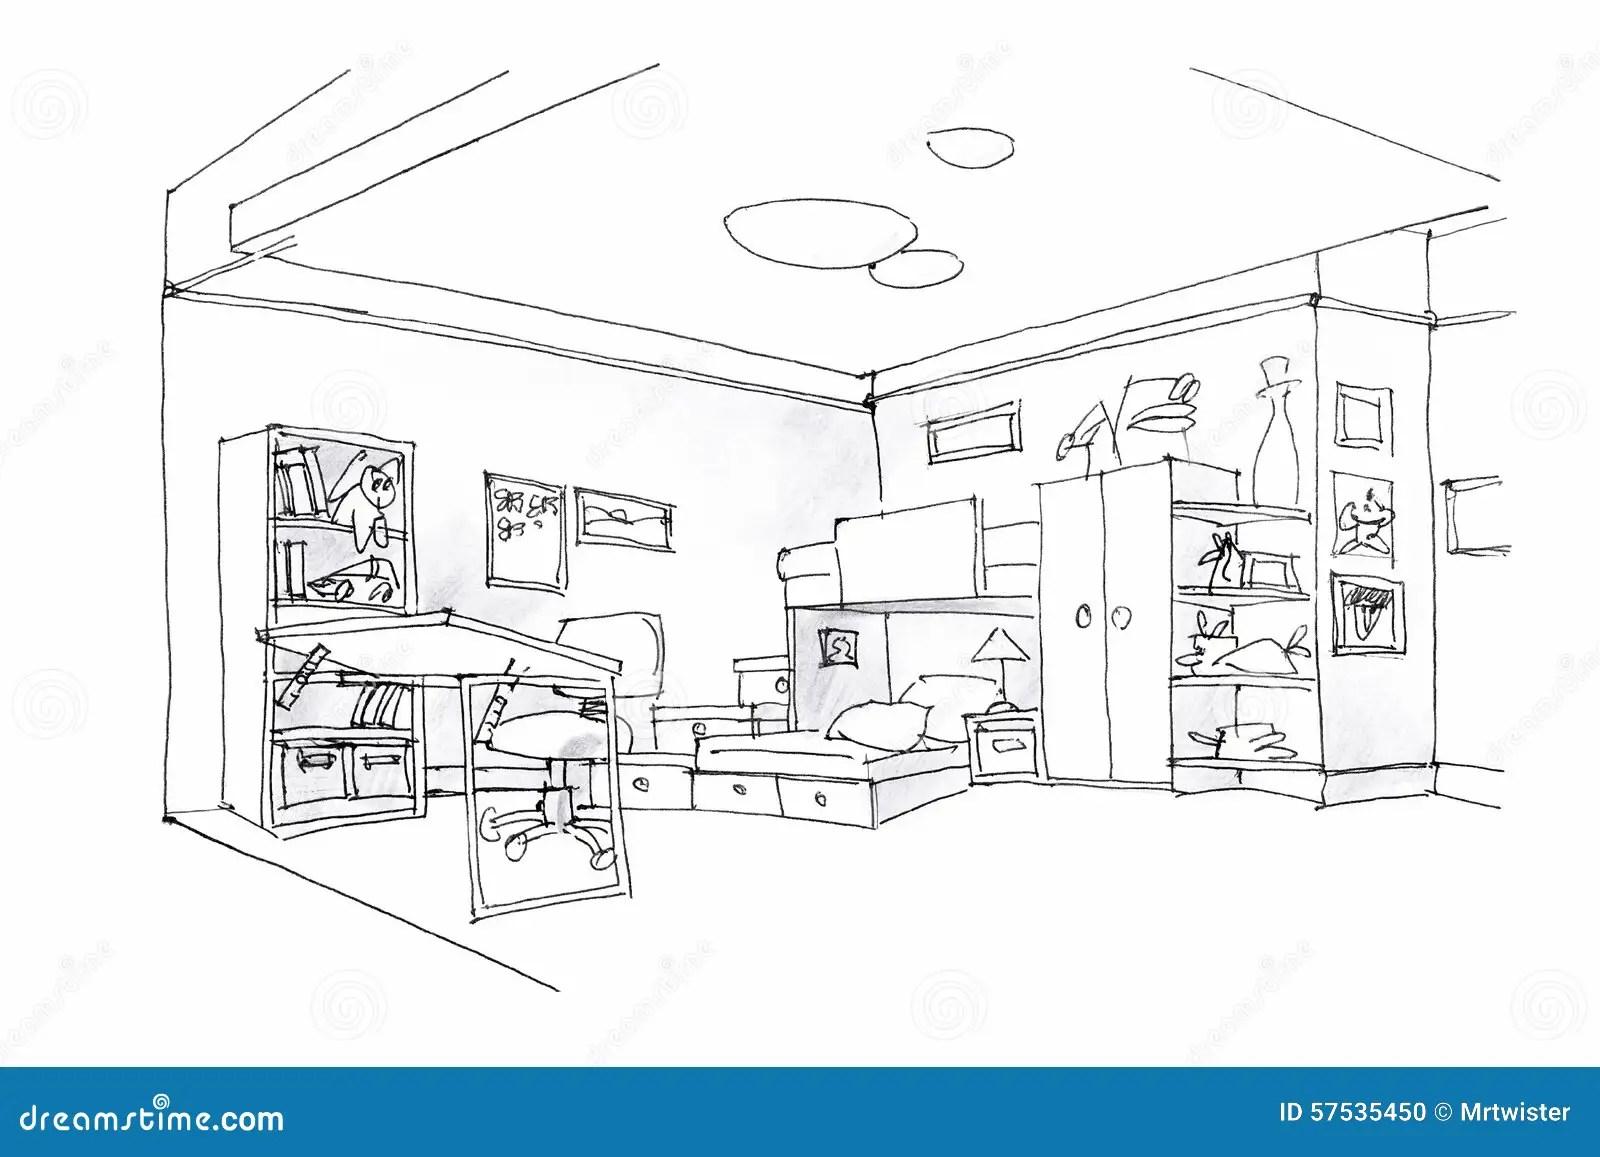 Kids Room Sketch In Black And White Stock Illustration